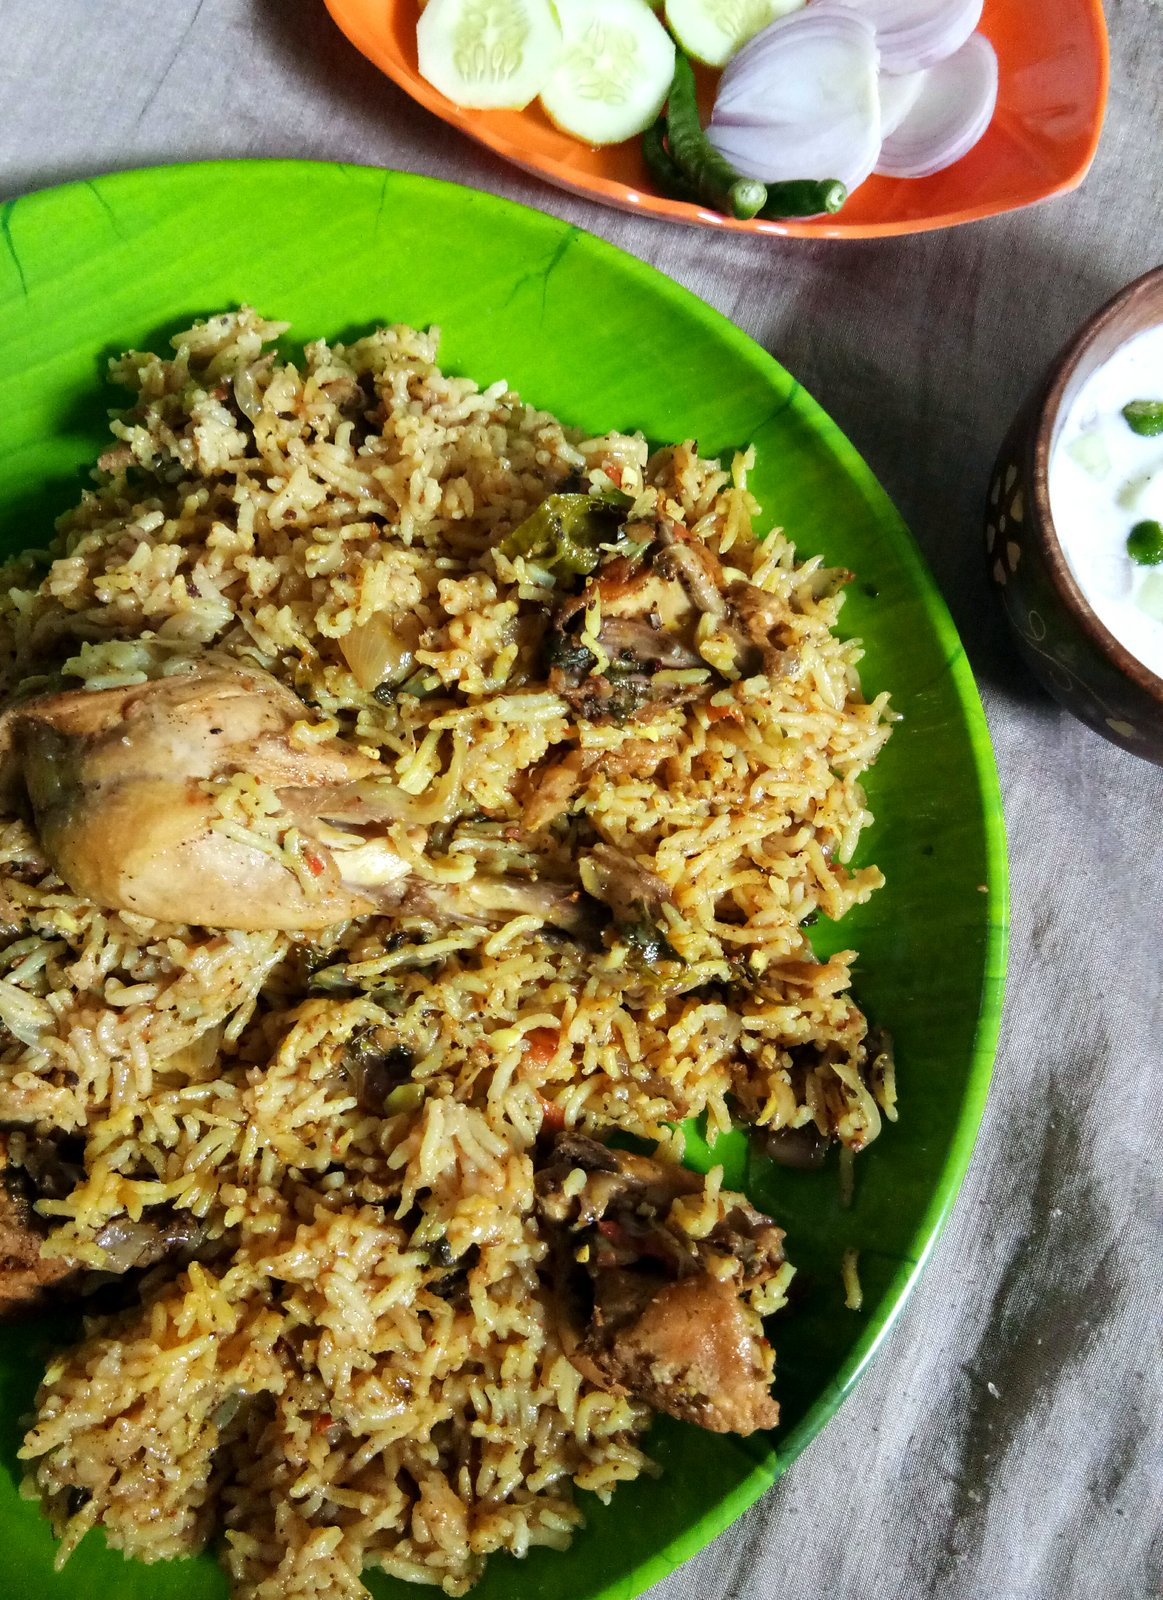 Thalapakattu chicken biryani recipe by archanas kitchen thalapakattu chicken biryani recipe forumfinder Image collections